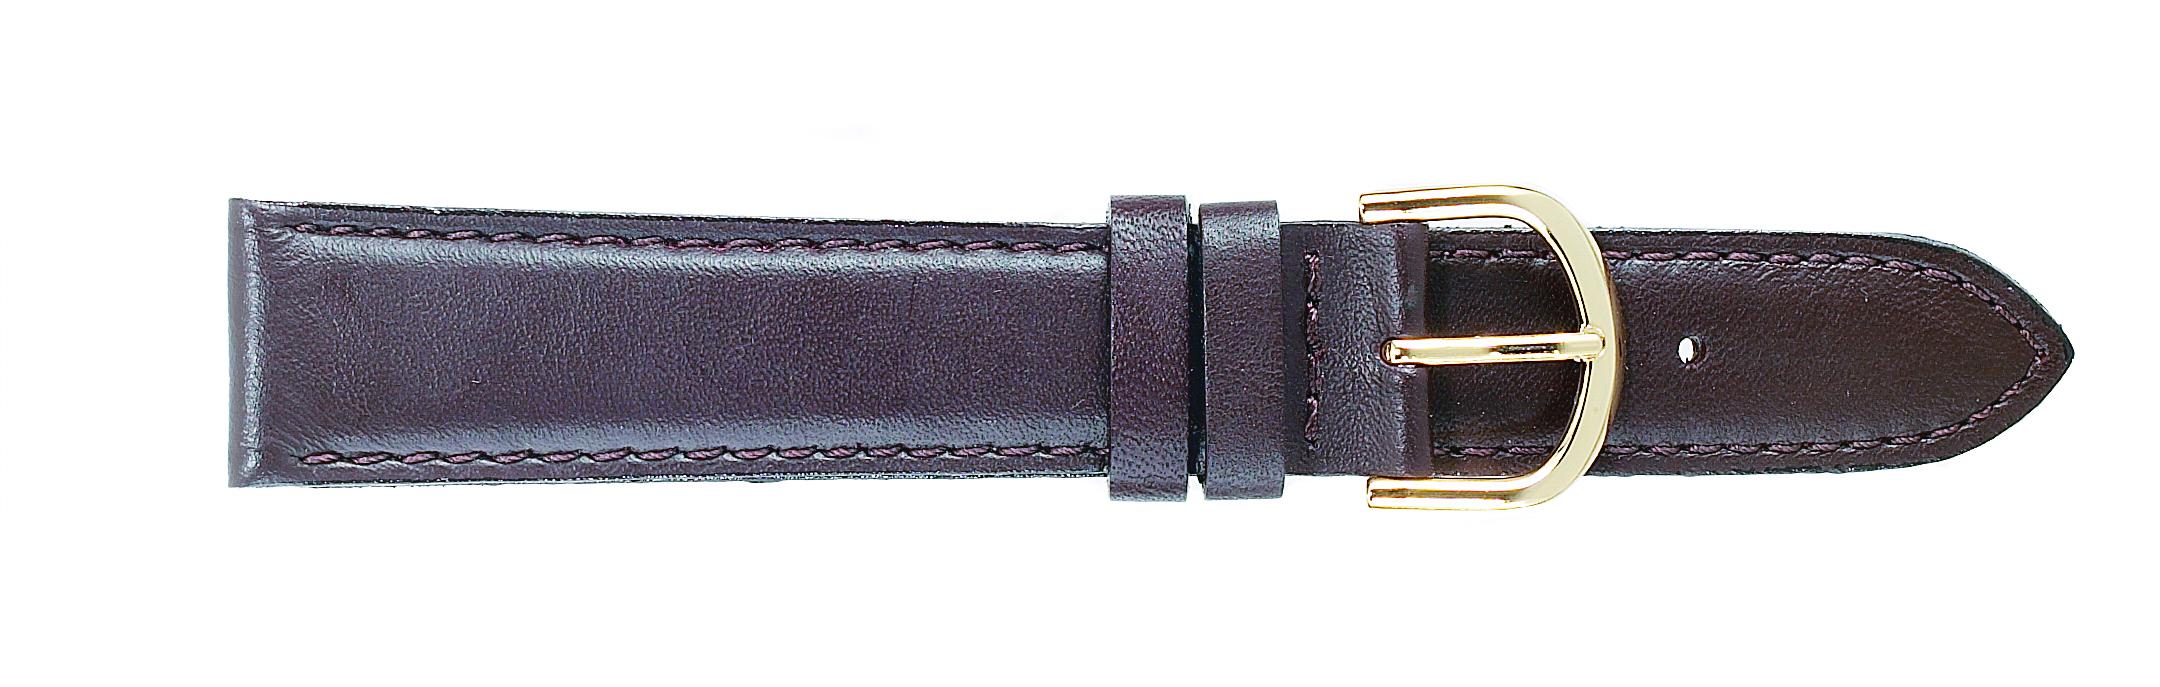 16mm Padded Calf Brown Strap-0